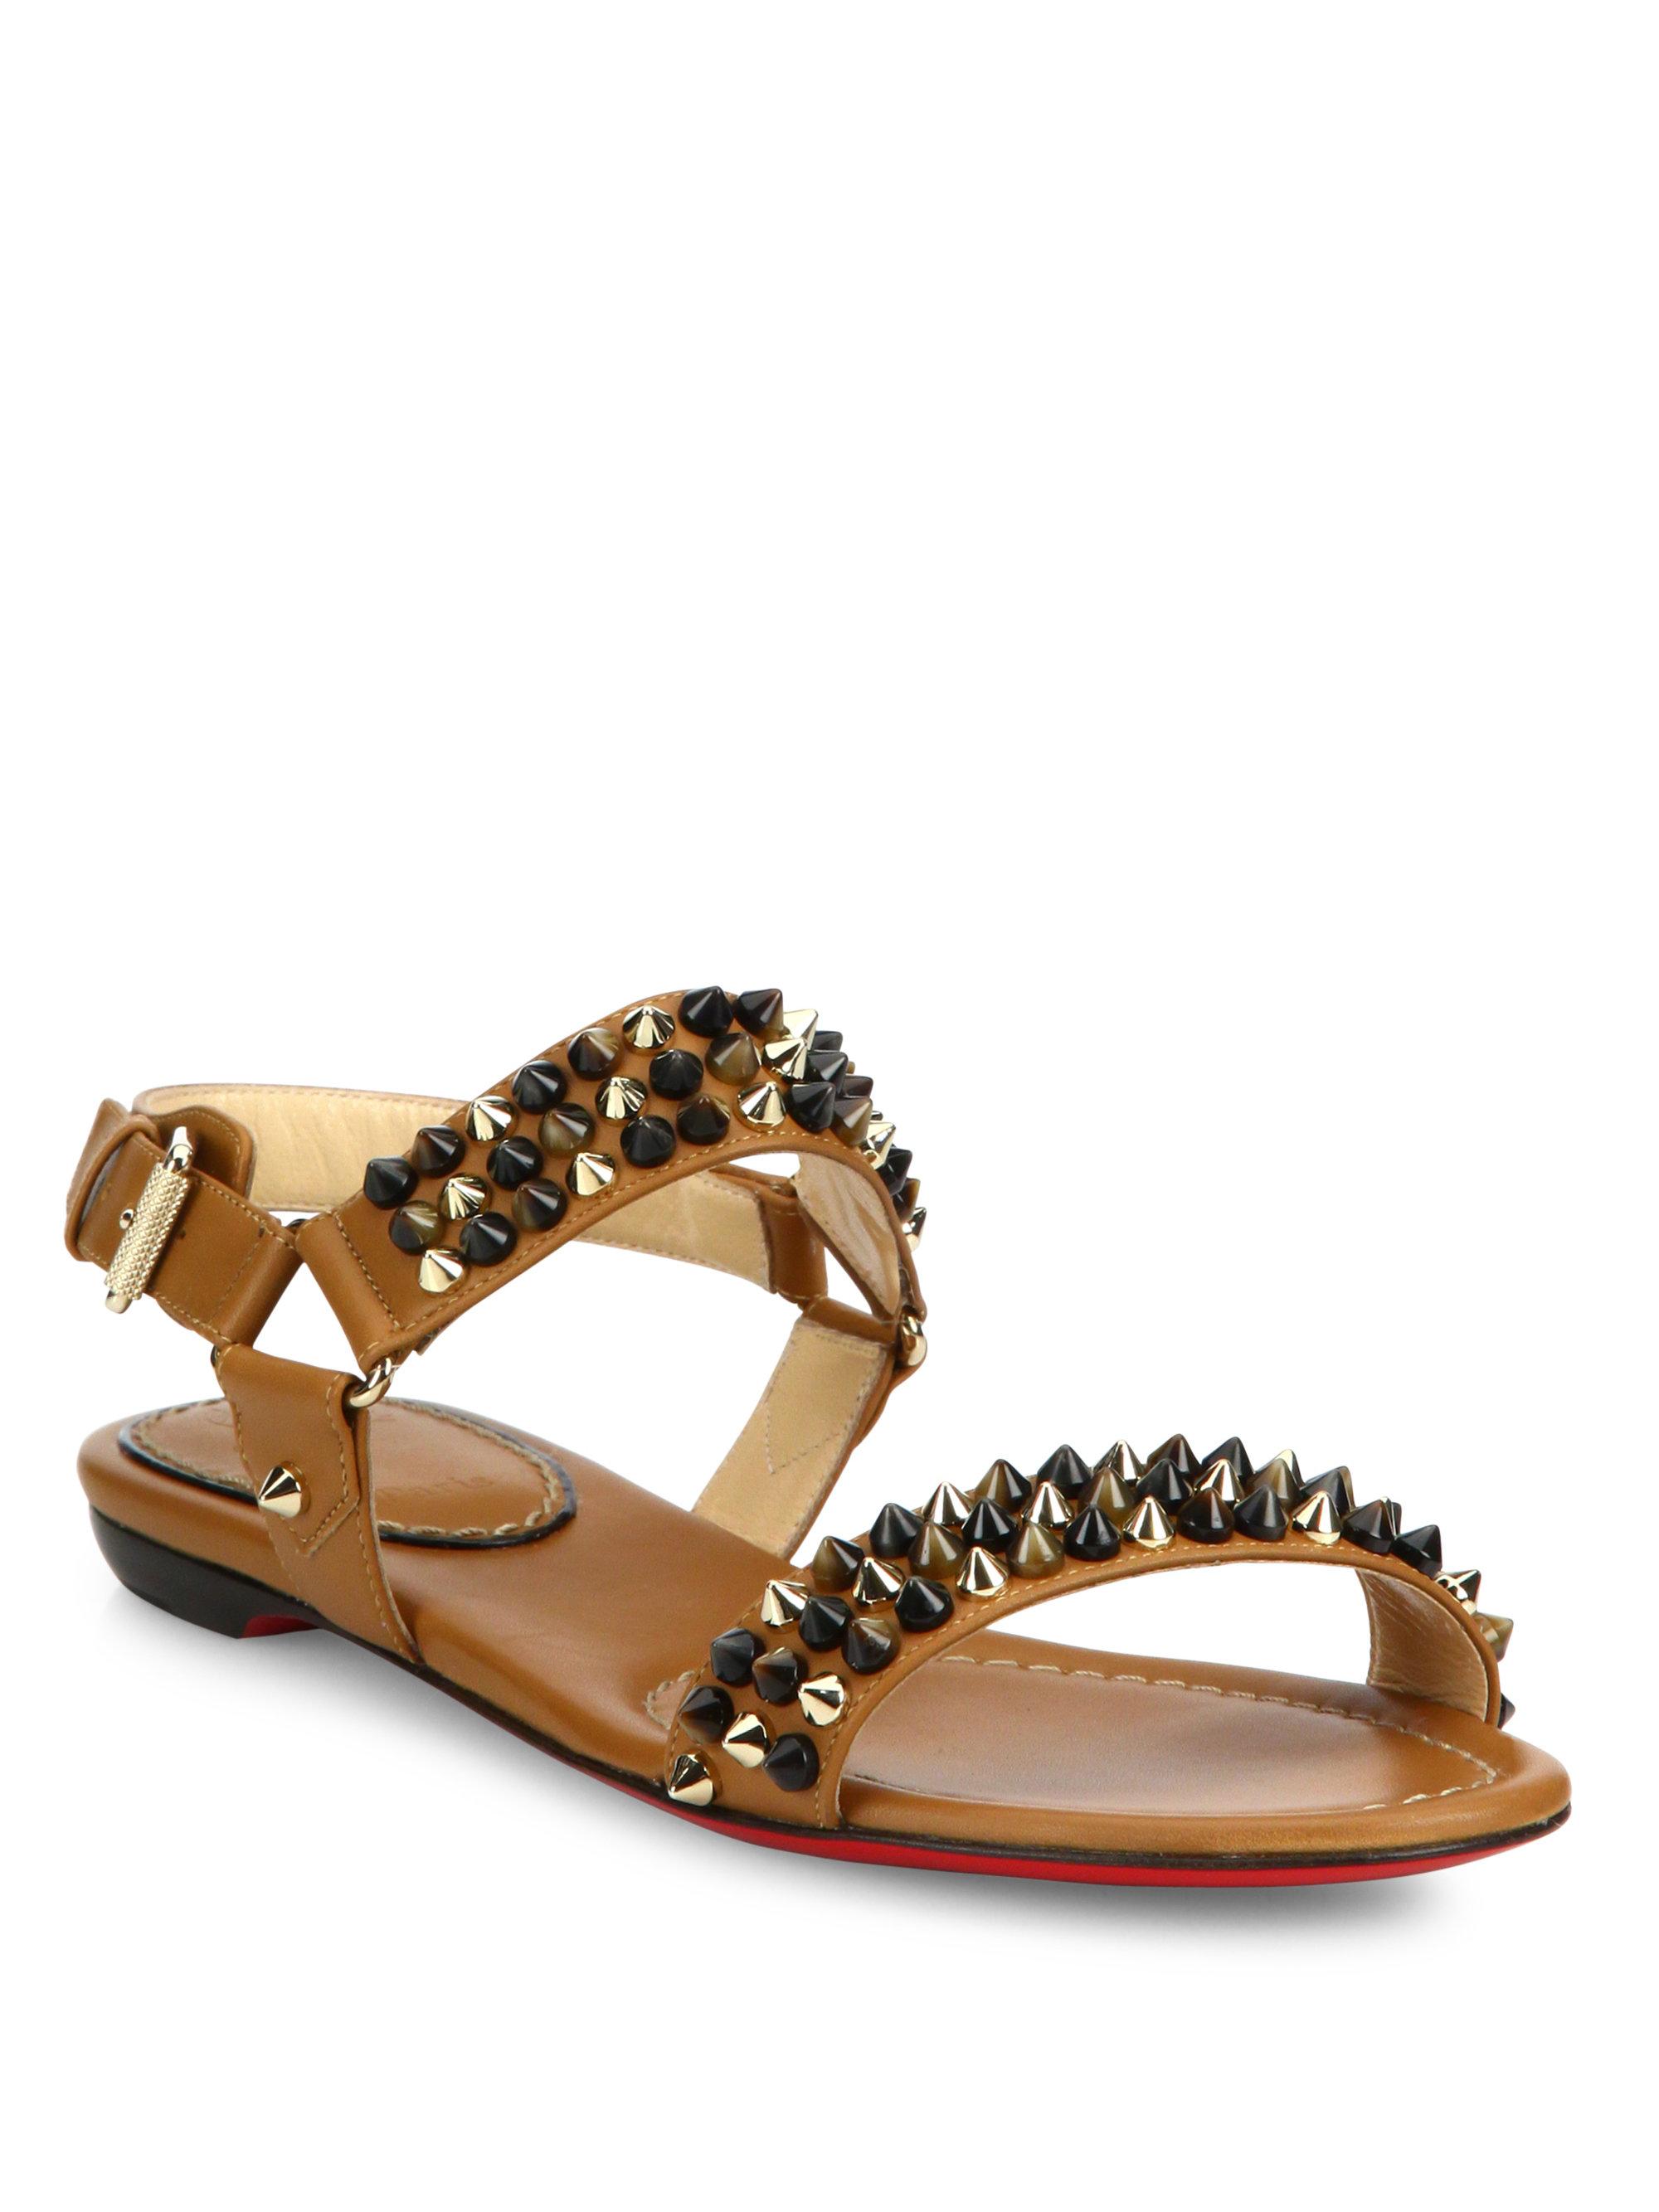 7adbfe2b4af real louboutin flat sandals 4e9ff 23281